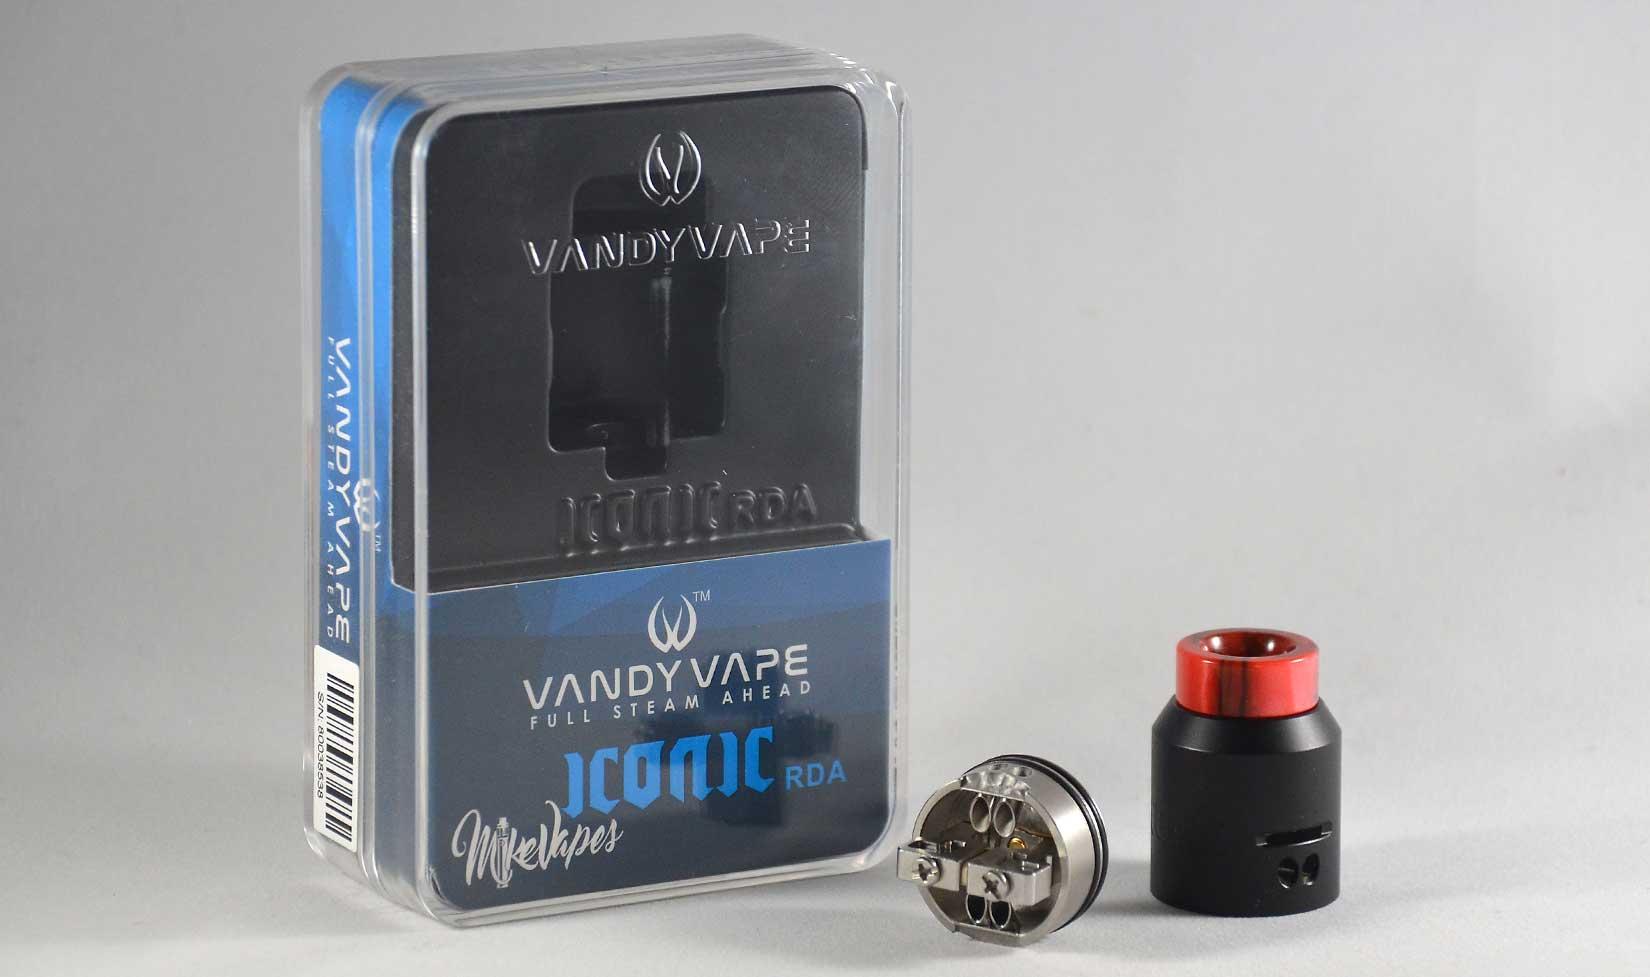 The Vandy Vape Iconic RDA